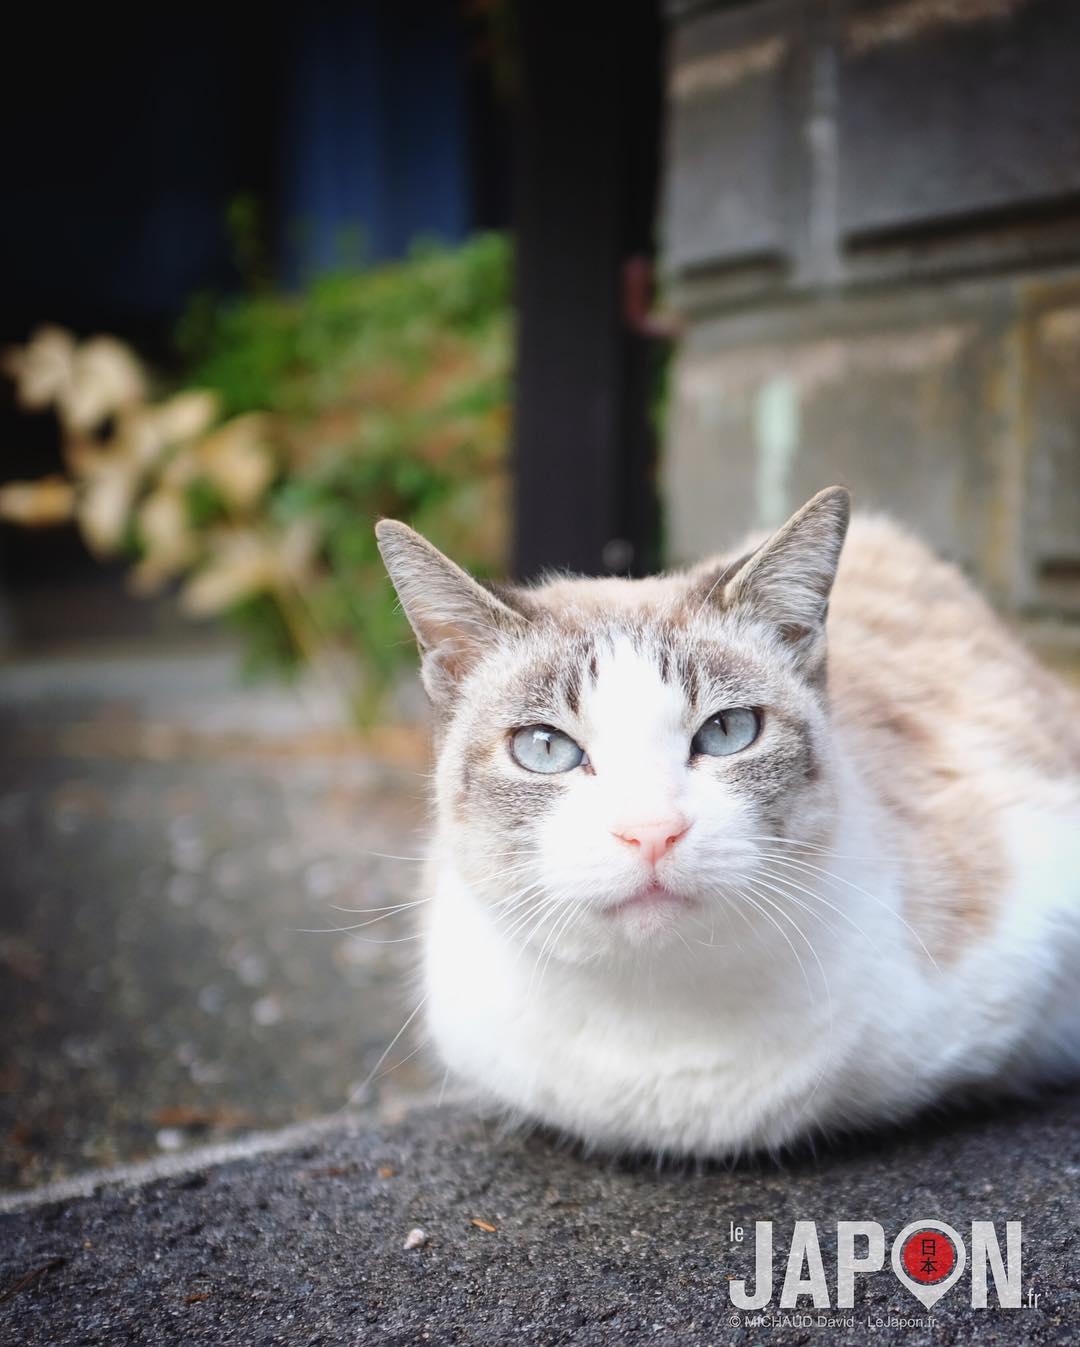 Bientôt les derniers habitants de Sagiura… 😸😸😸 #IzumoAdventures